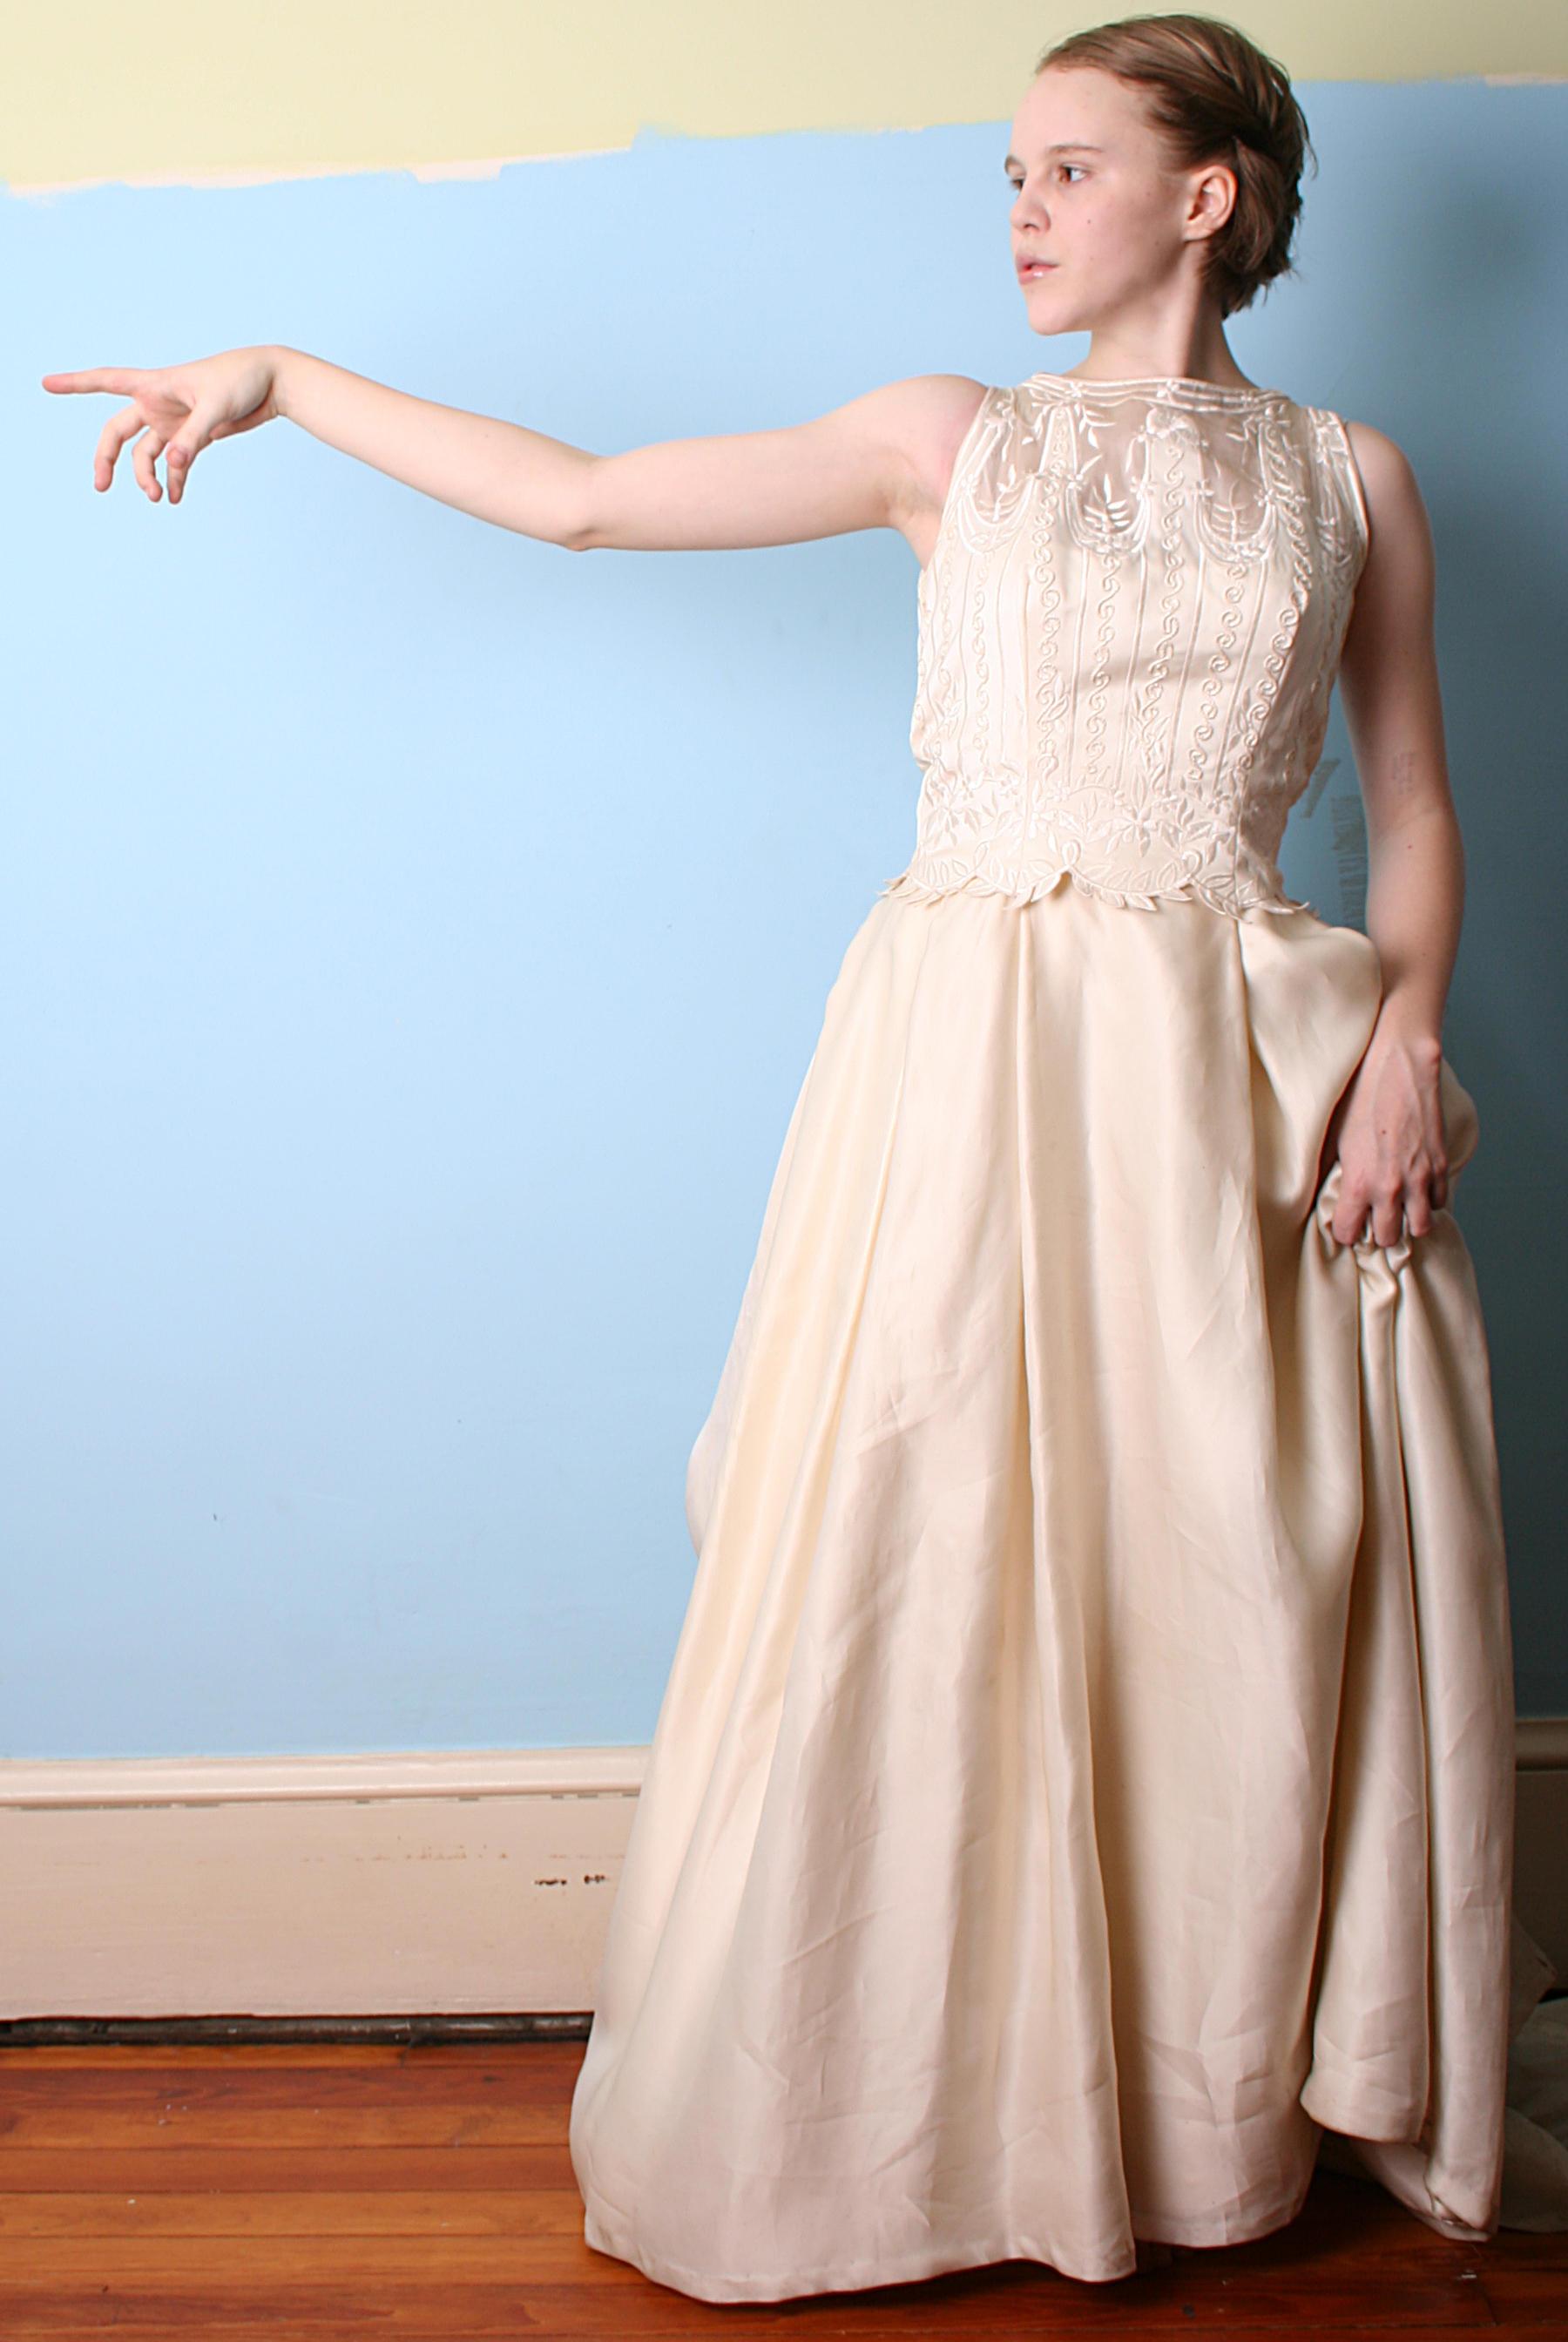 Wedding Dress 13 by AttempteStock